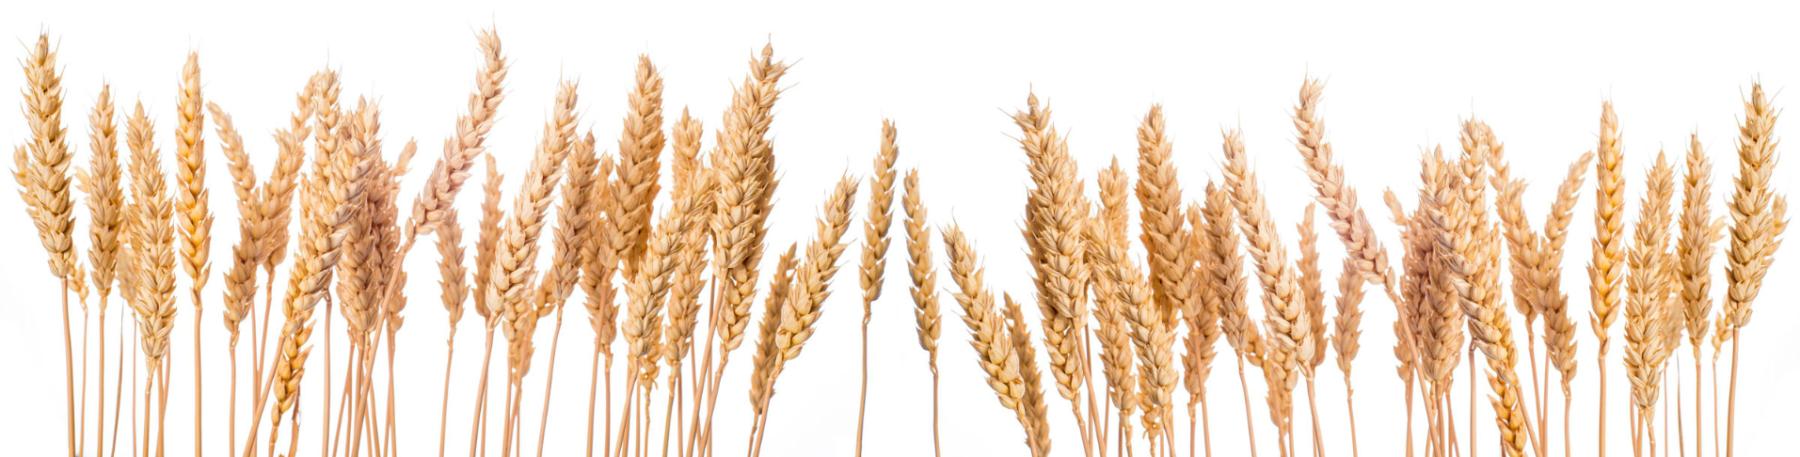 wheat-bottom-background